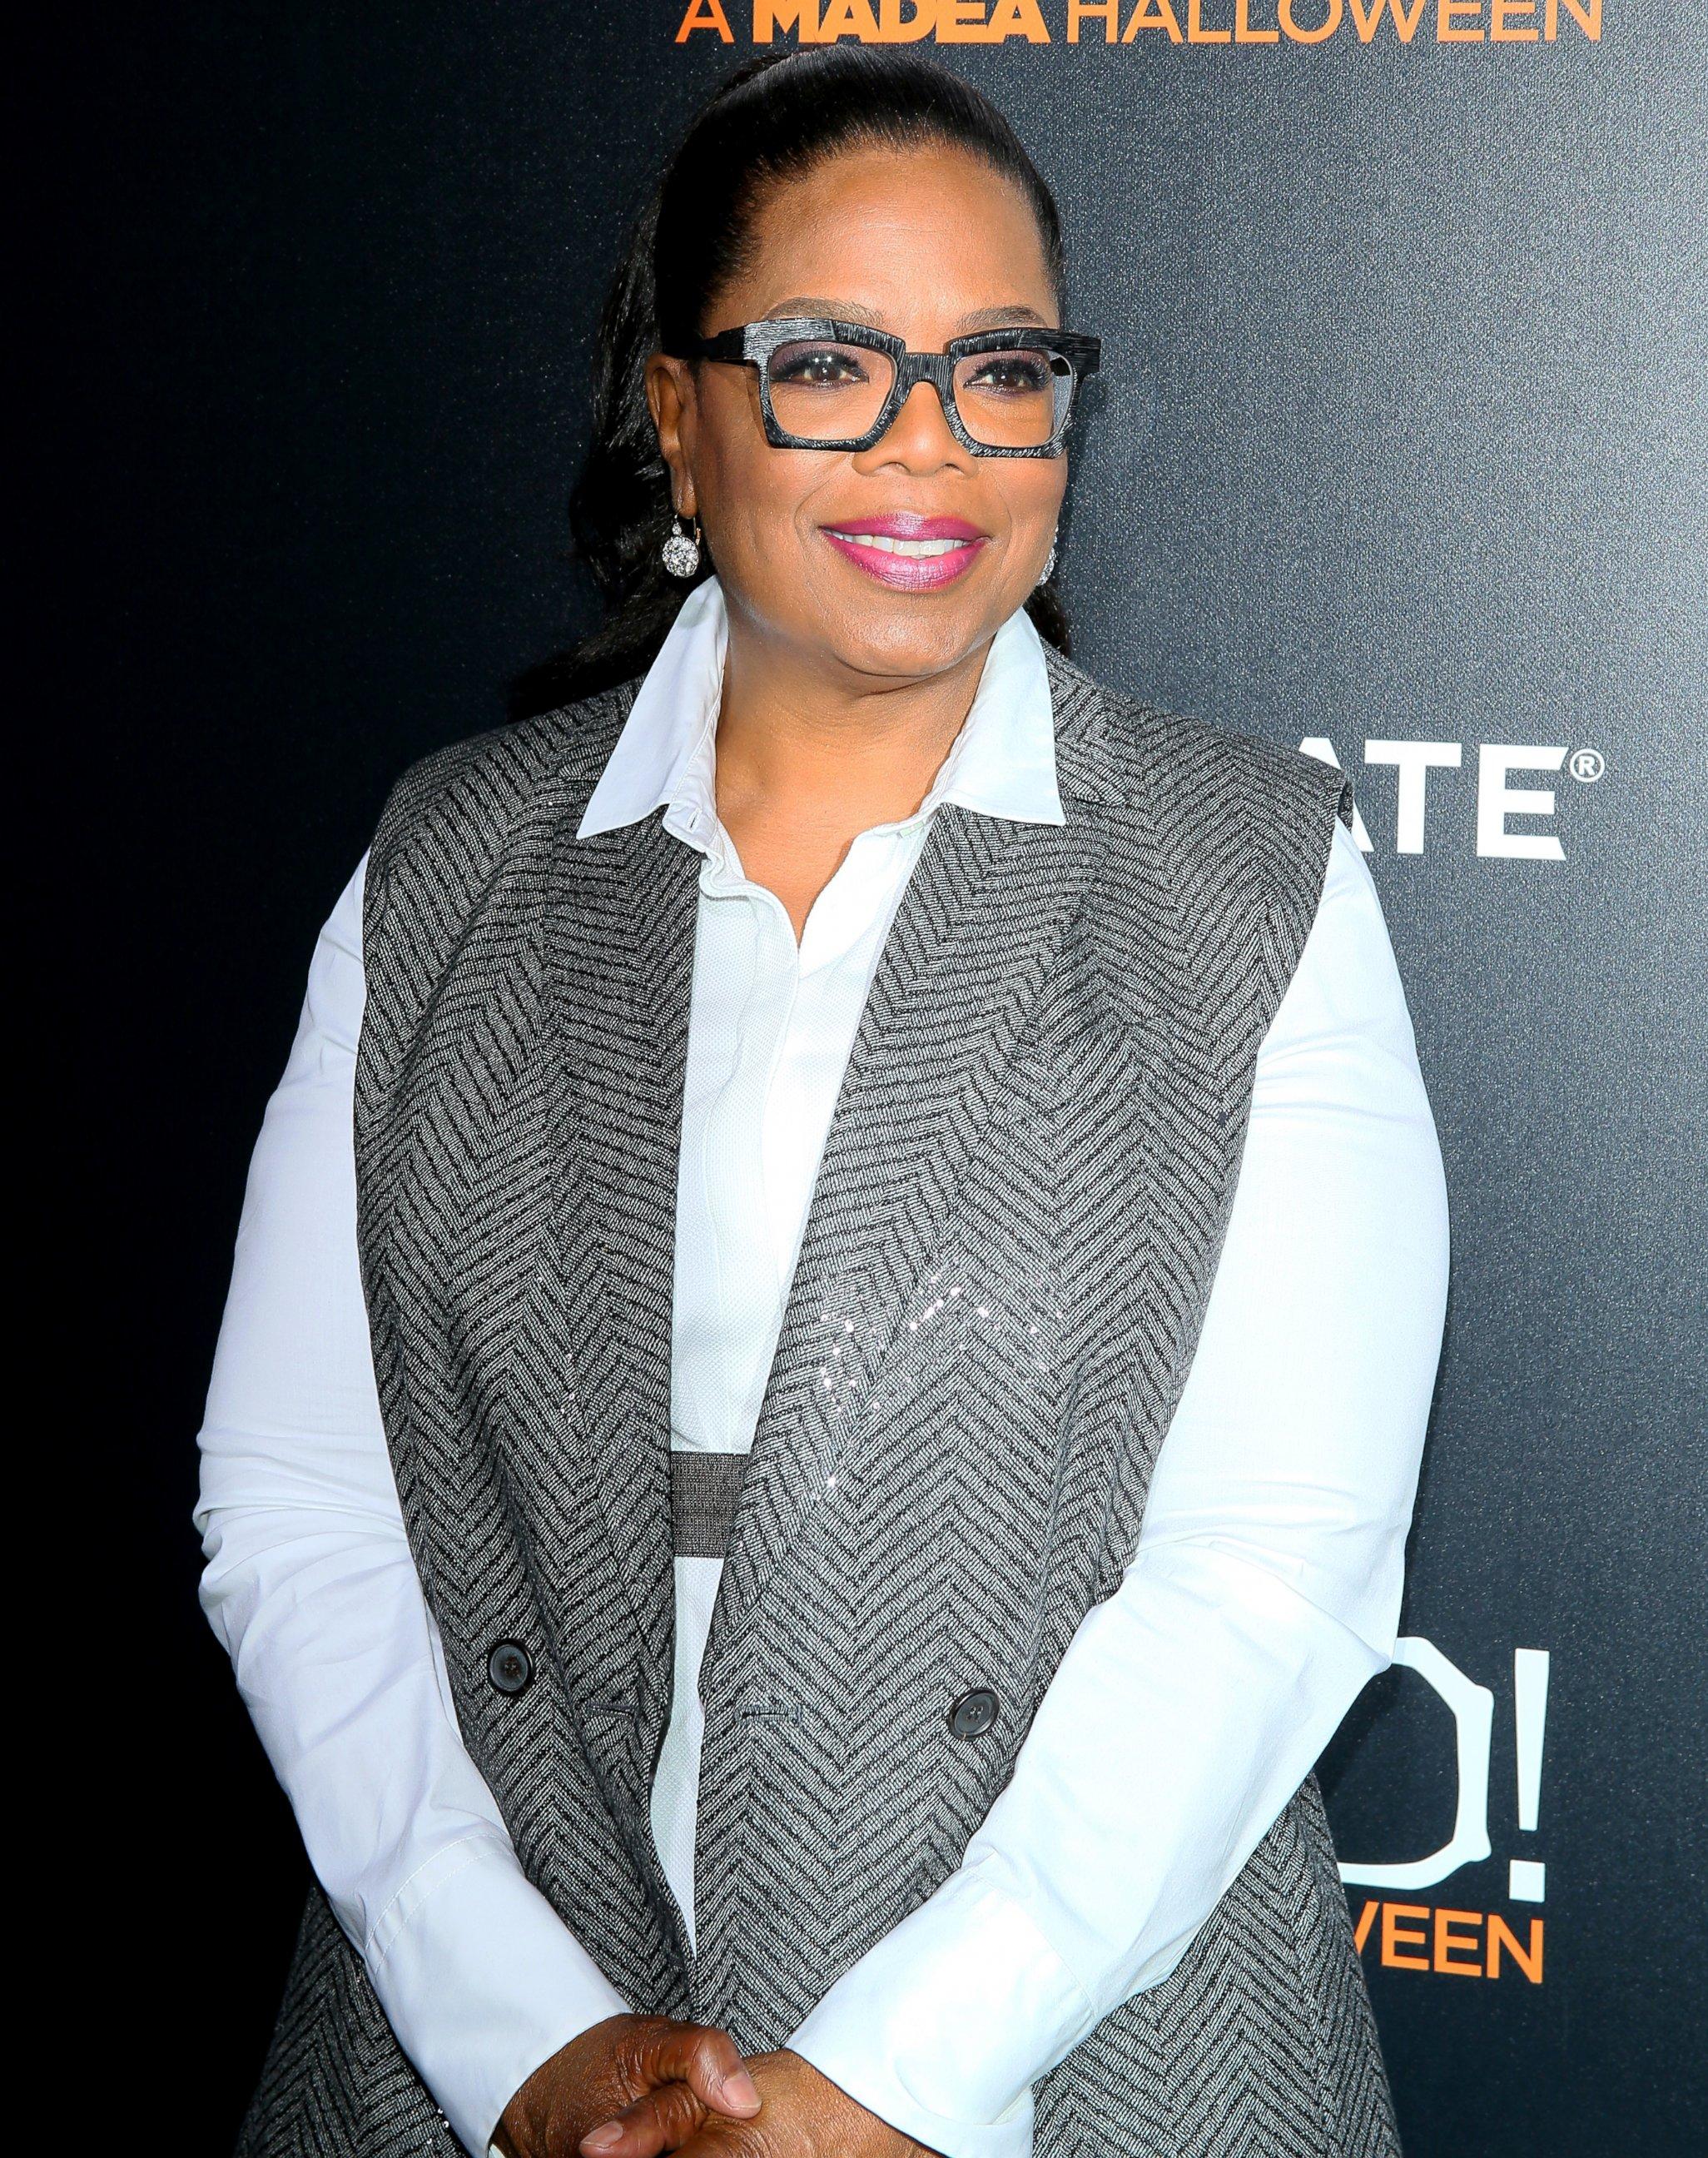 photo oprah winfrey - Oprah Winfrey Halloween Costume